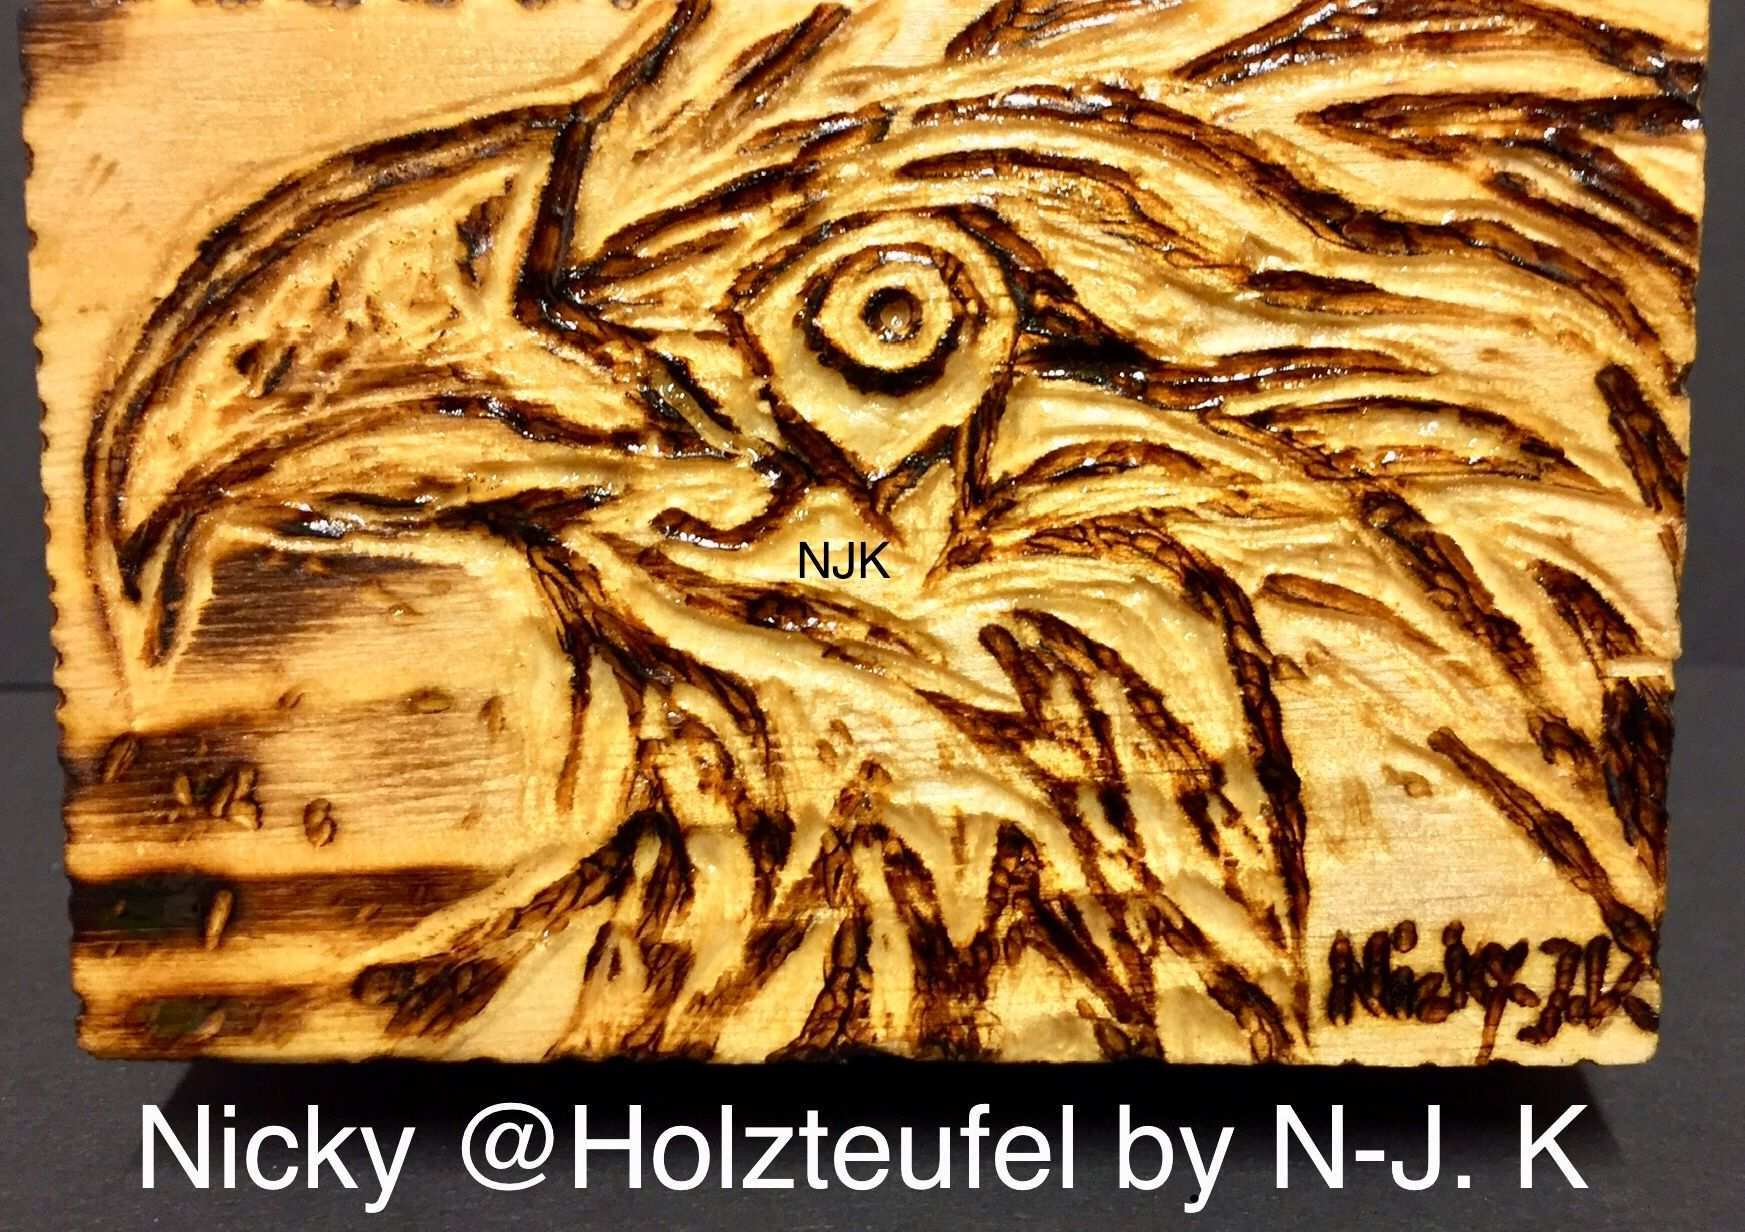 Dose Box Kiste Adler Eagle Brandmalerei Nicky Holzteufel By N J K Zeichnung Bild Holz Handwerk 3d Brandmalerei Holzschnitzkunst Zeichnung